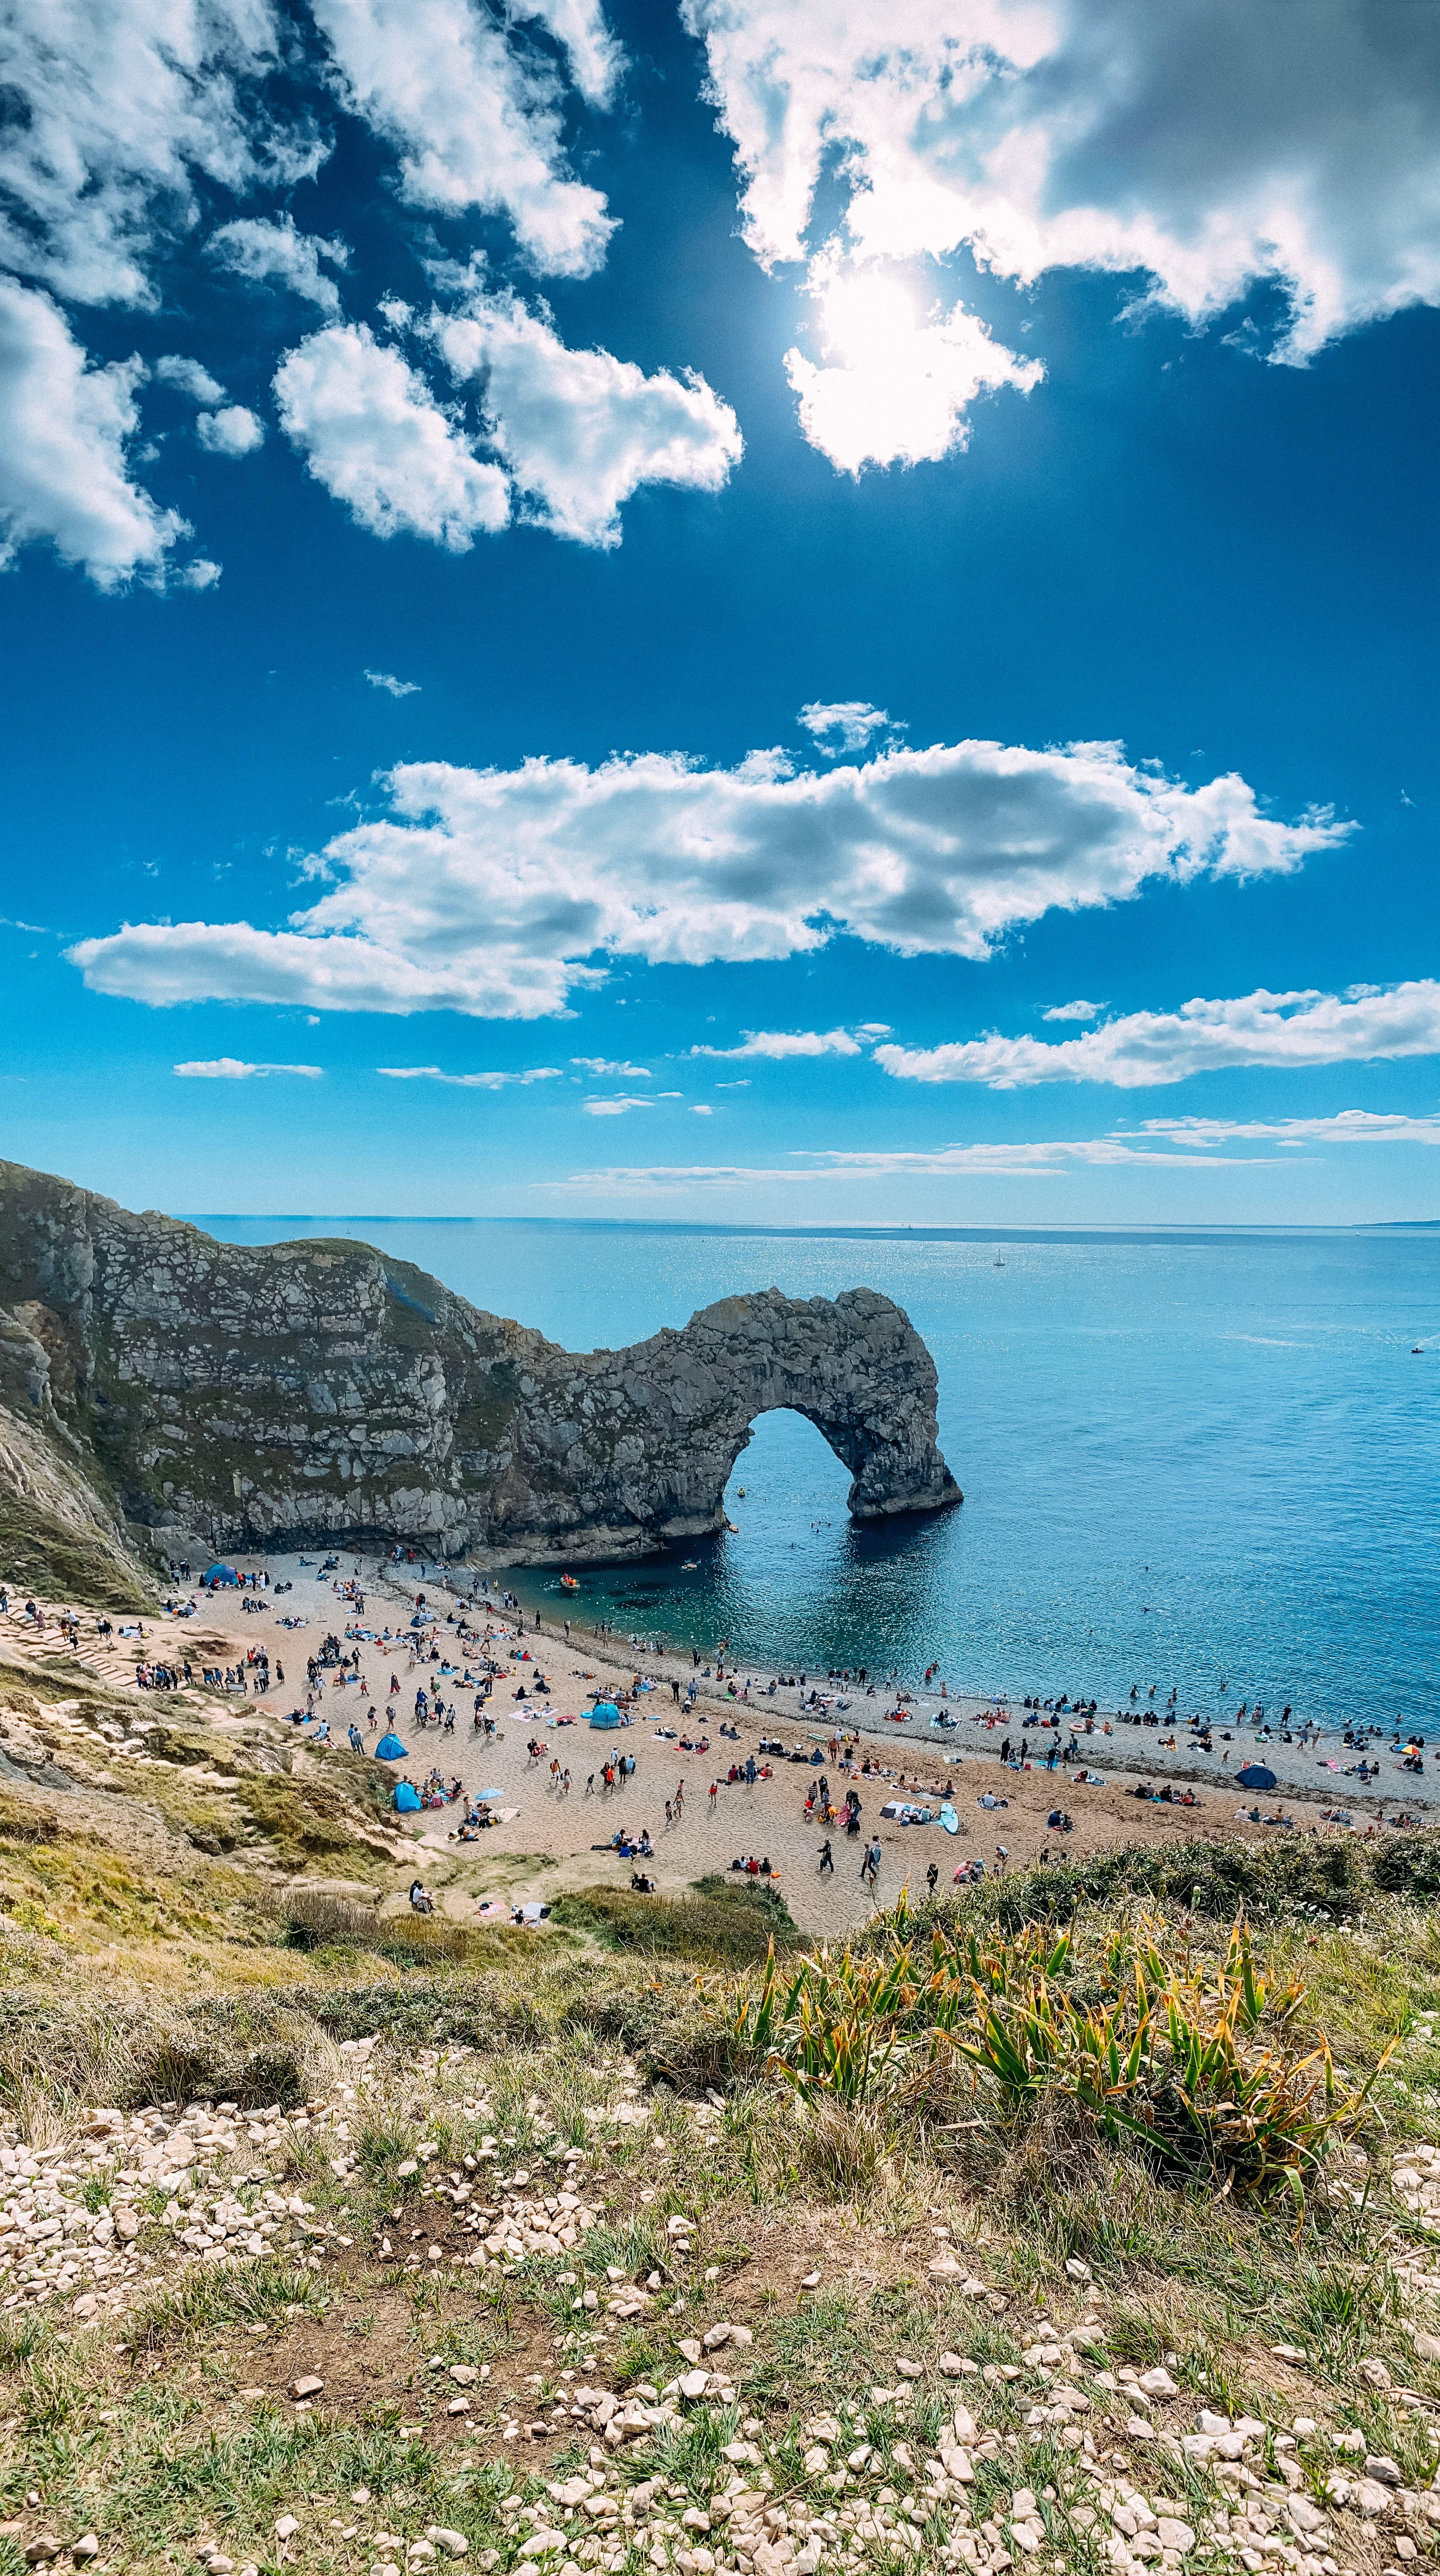 durdledoor, dorset UK during the summer with blue sky